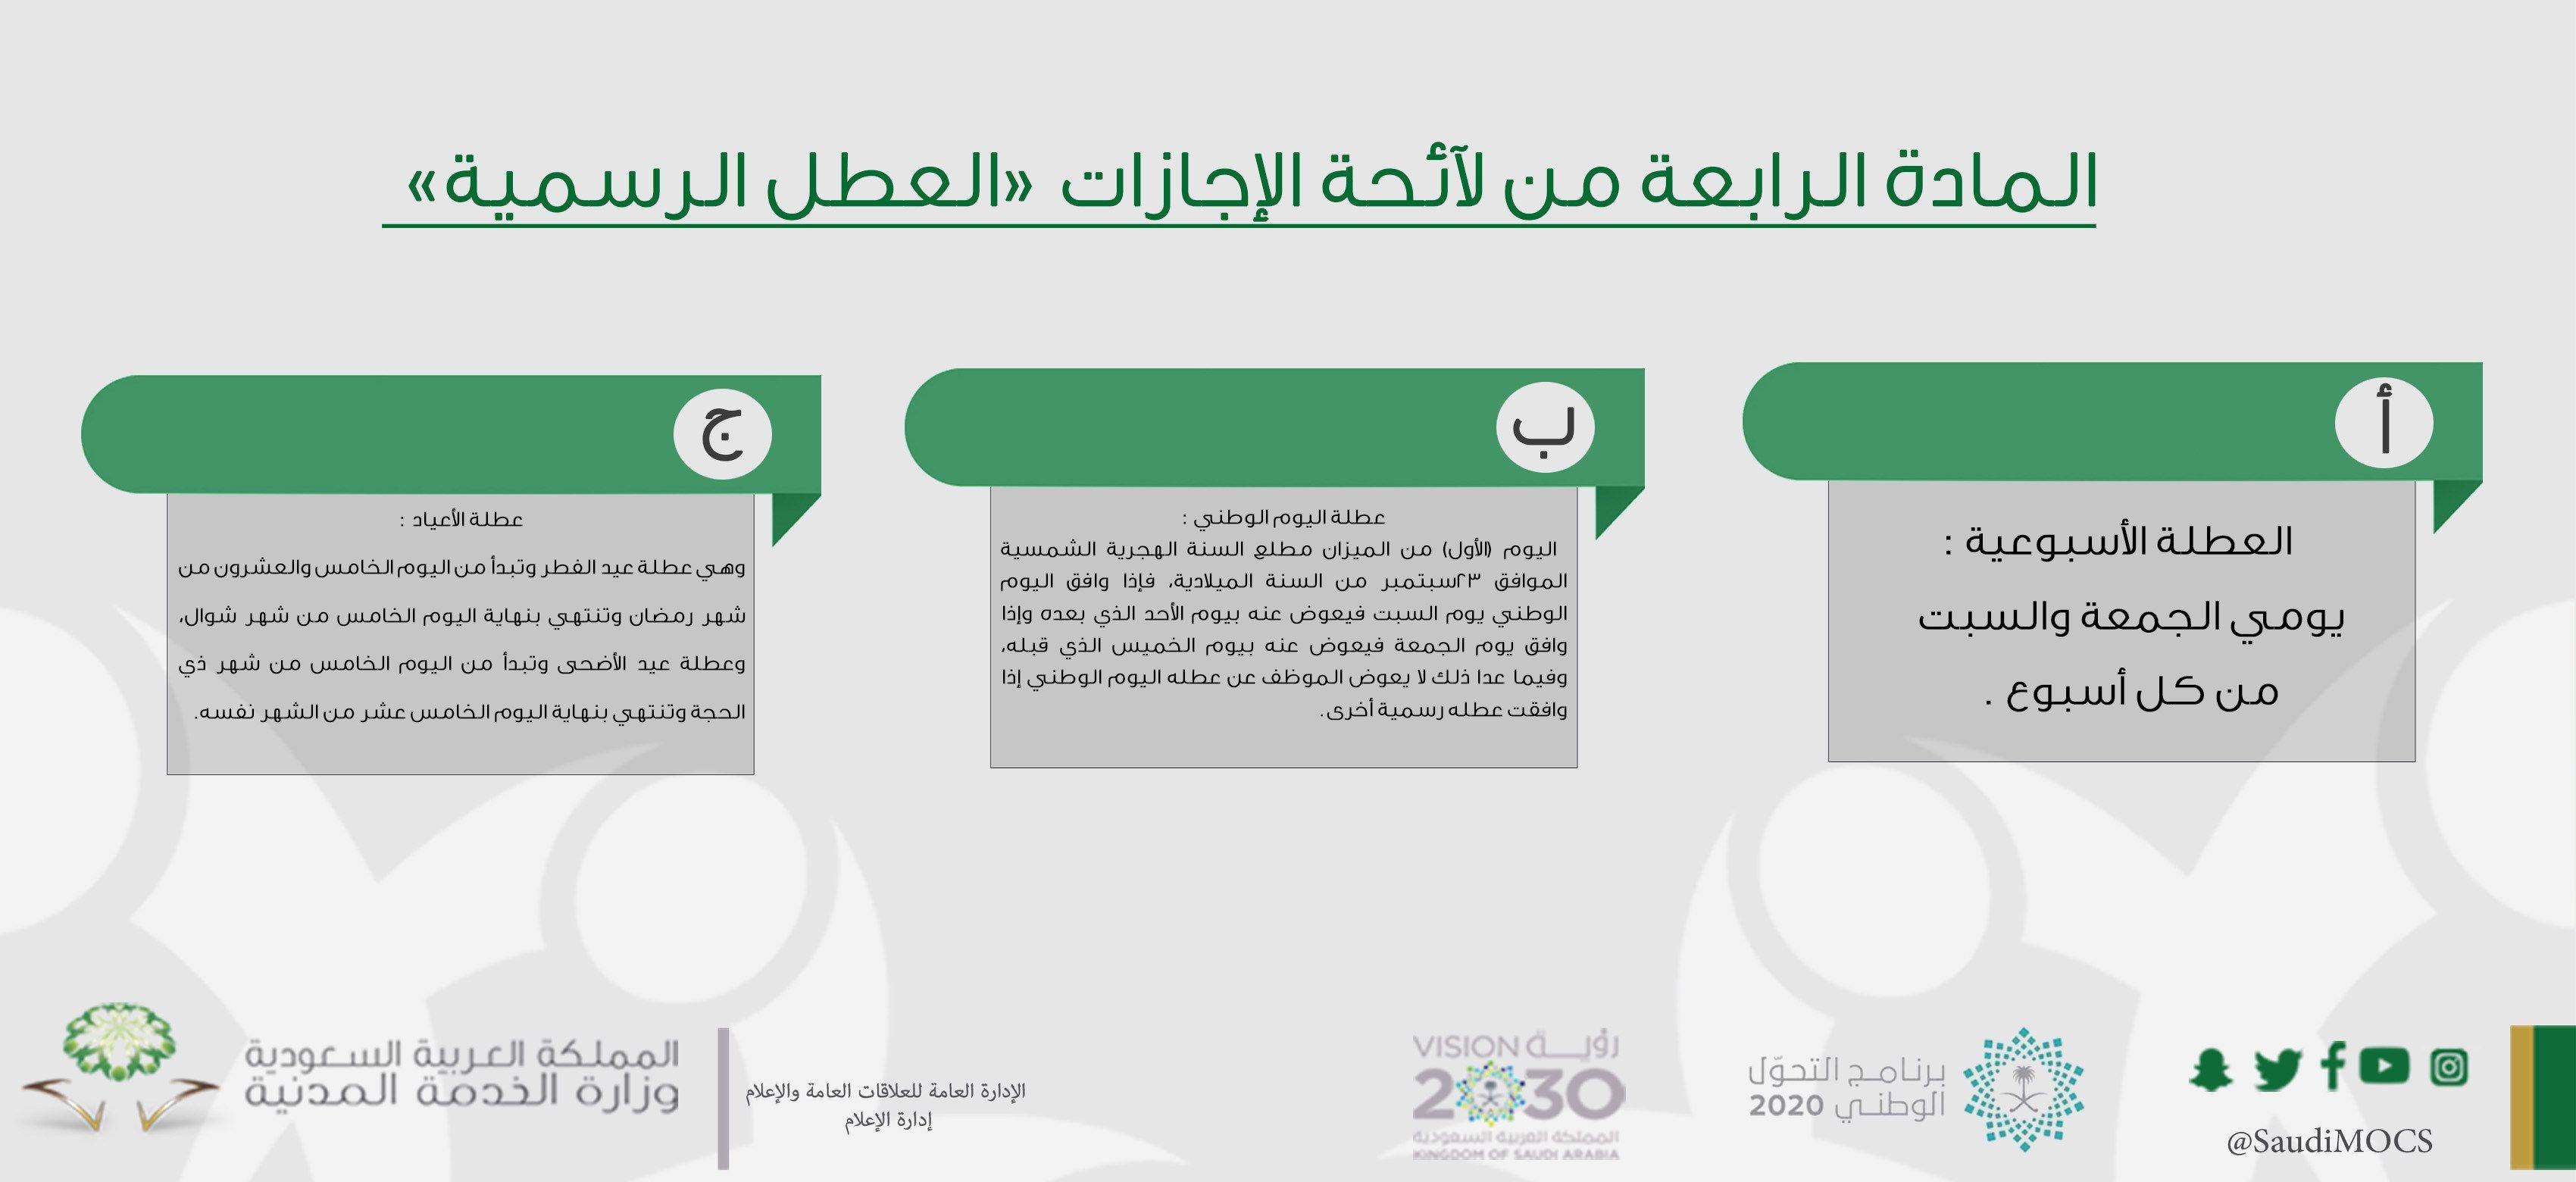 وظائف السعوديه On Twitter Ios Messenger